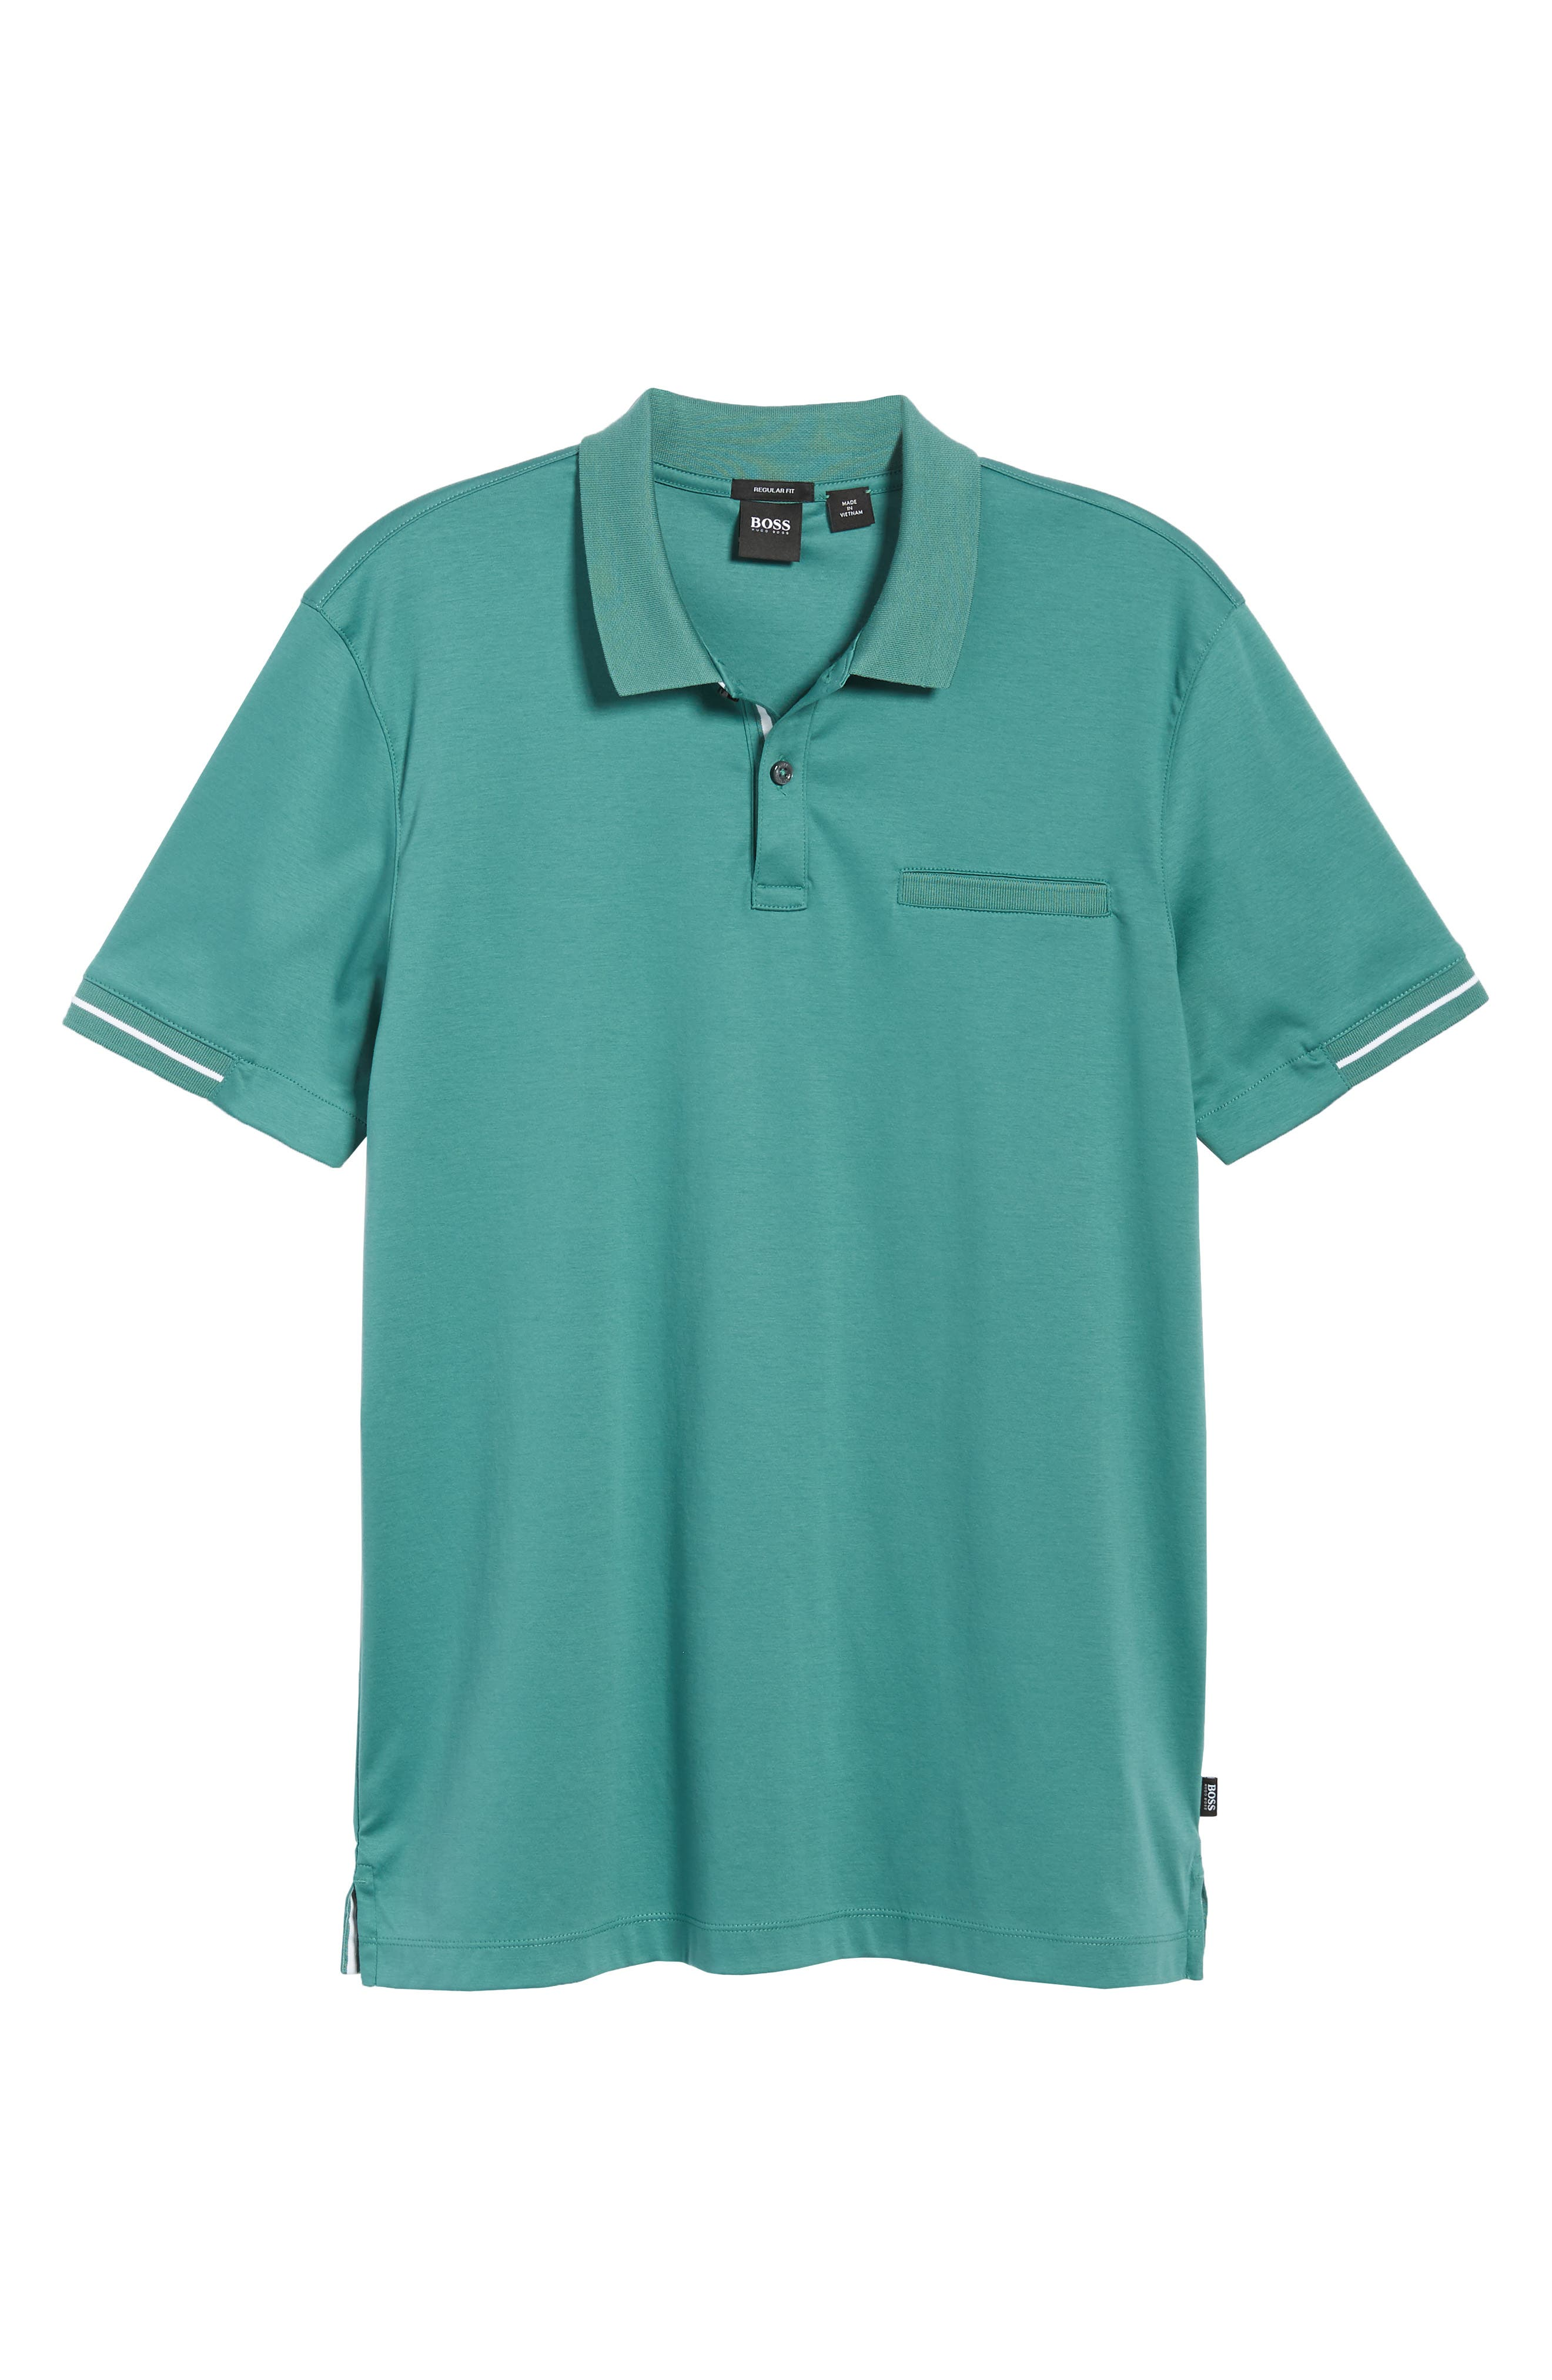 6aec625a6 Men's BOSS Polo Shirts | Nordstrom